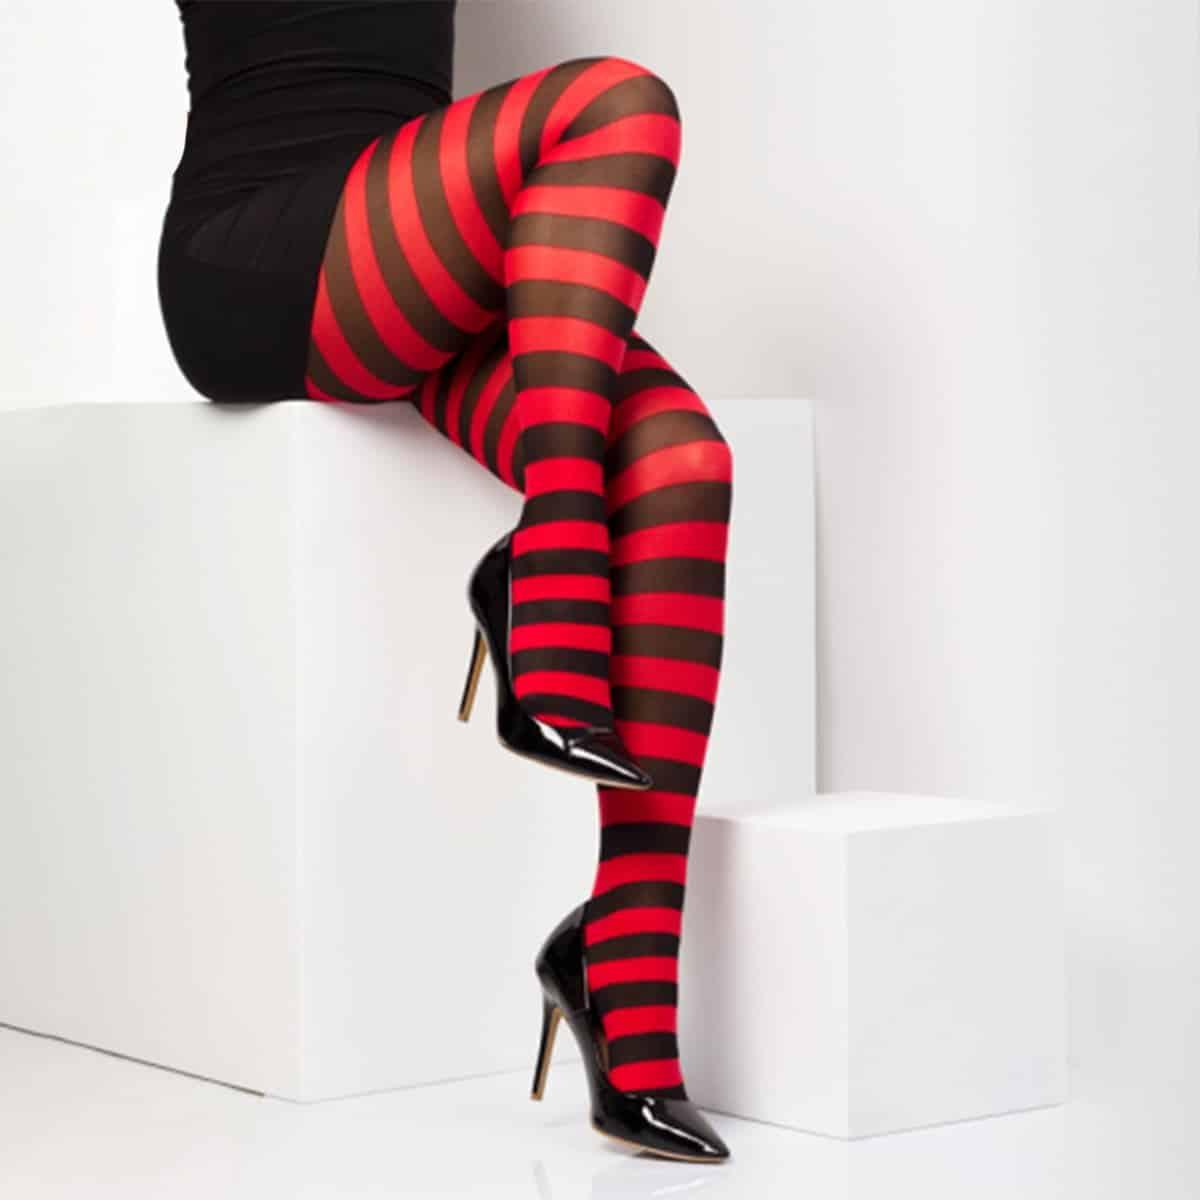 c570d7002 Twickers – rød og svart stripete strømpebukser